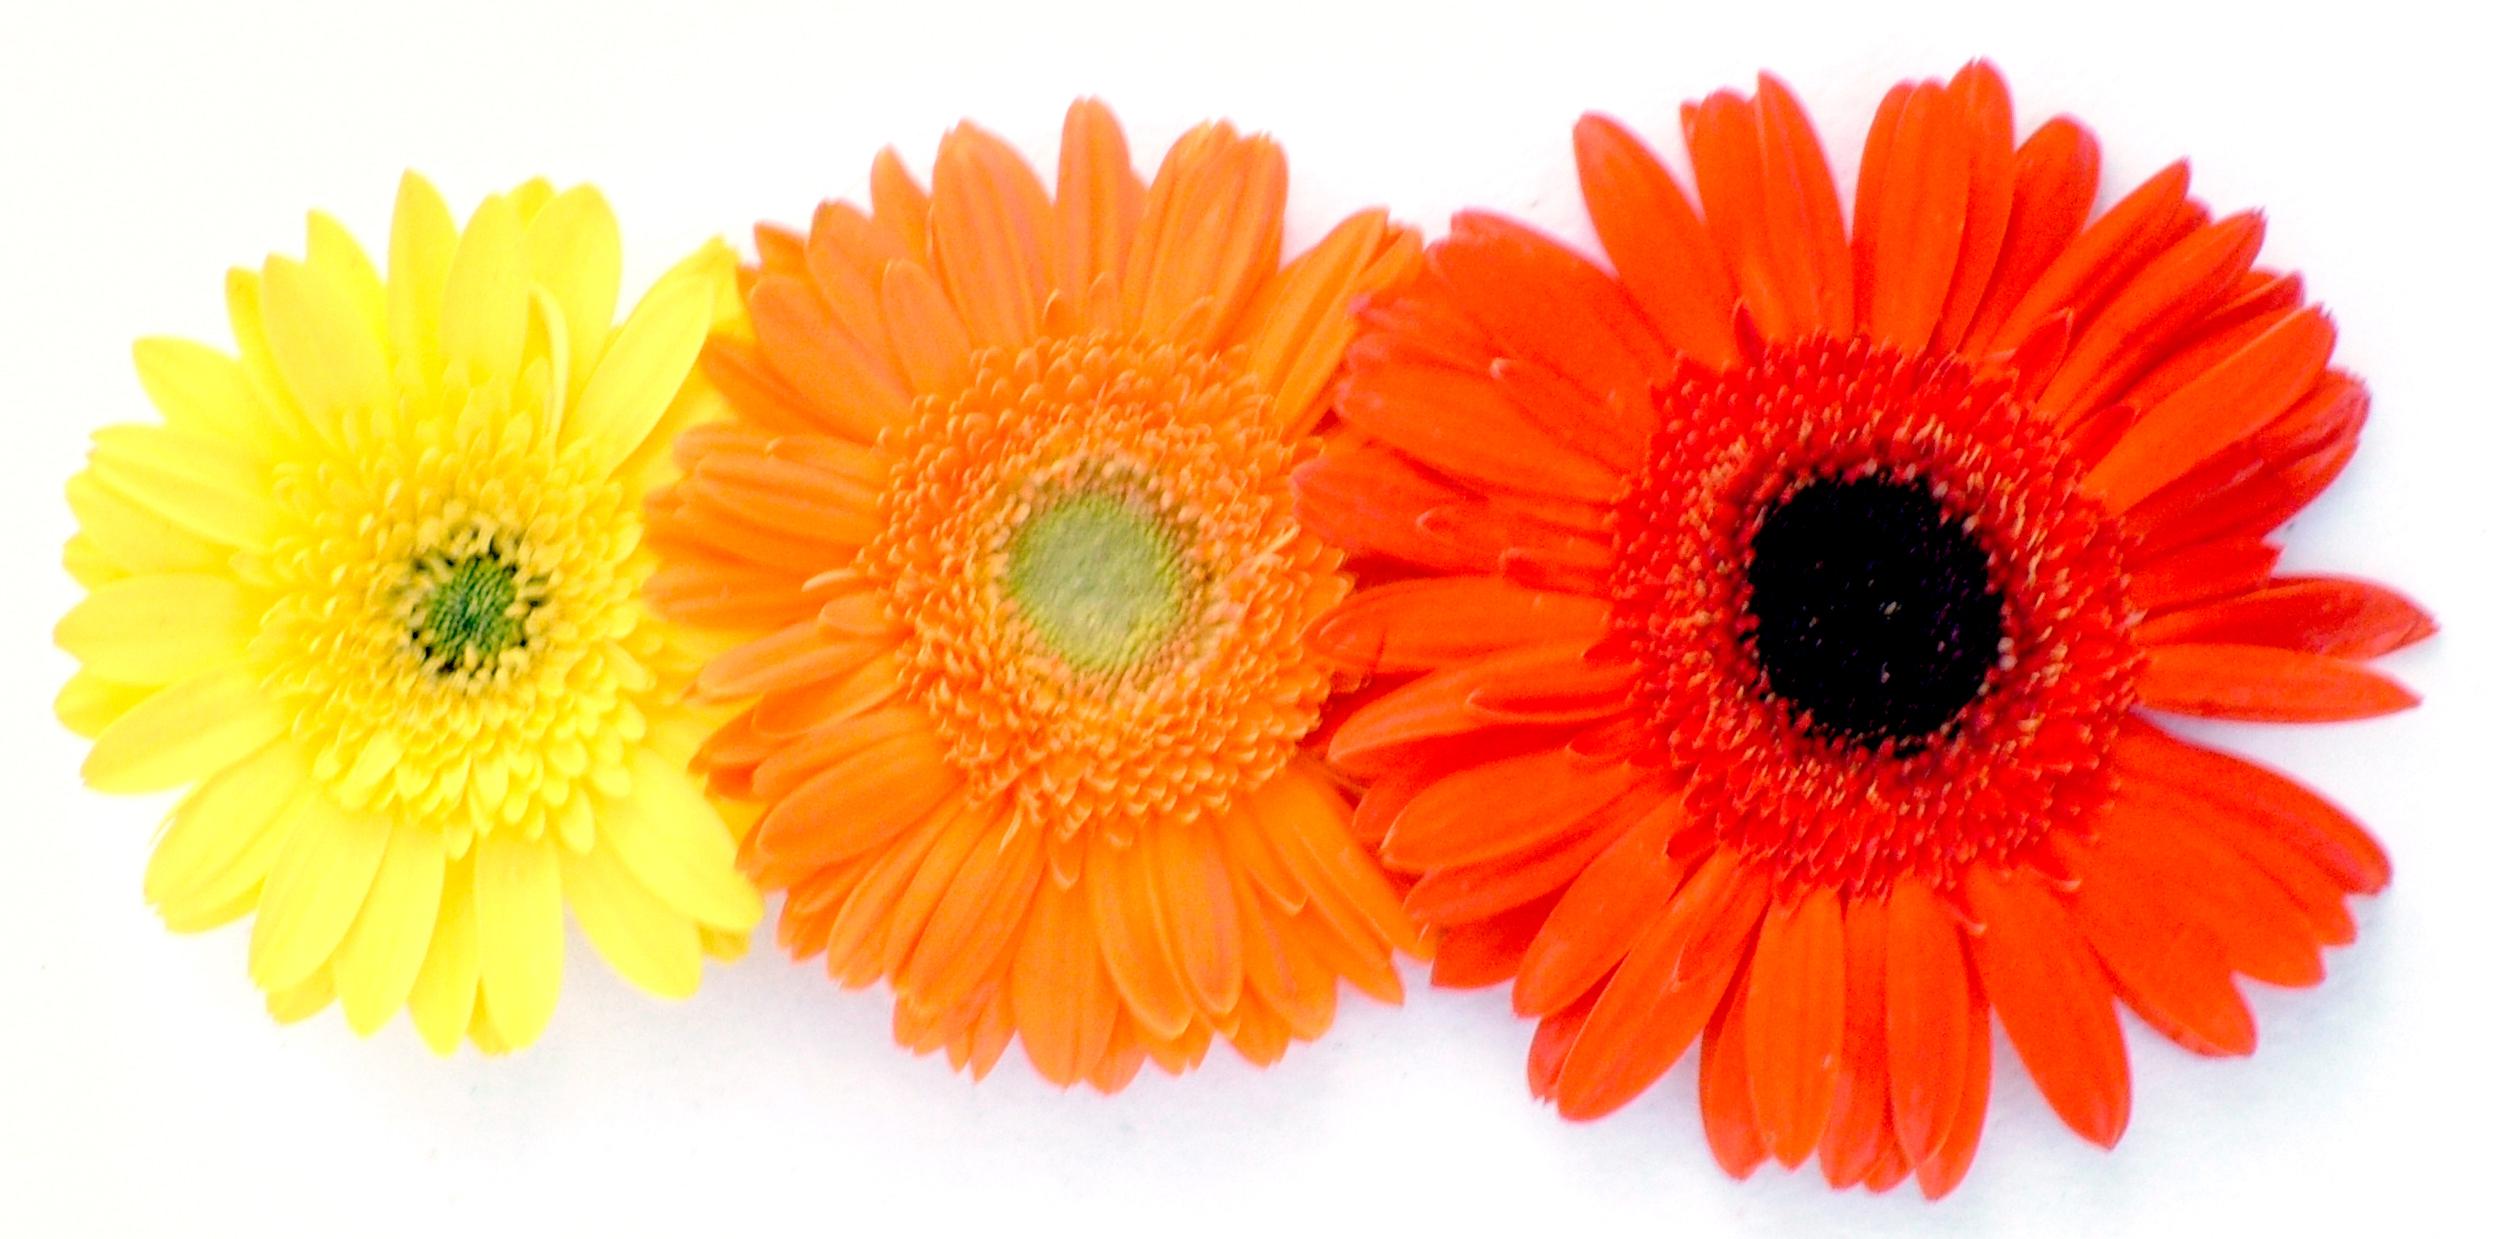 Gerbera flower photo